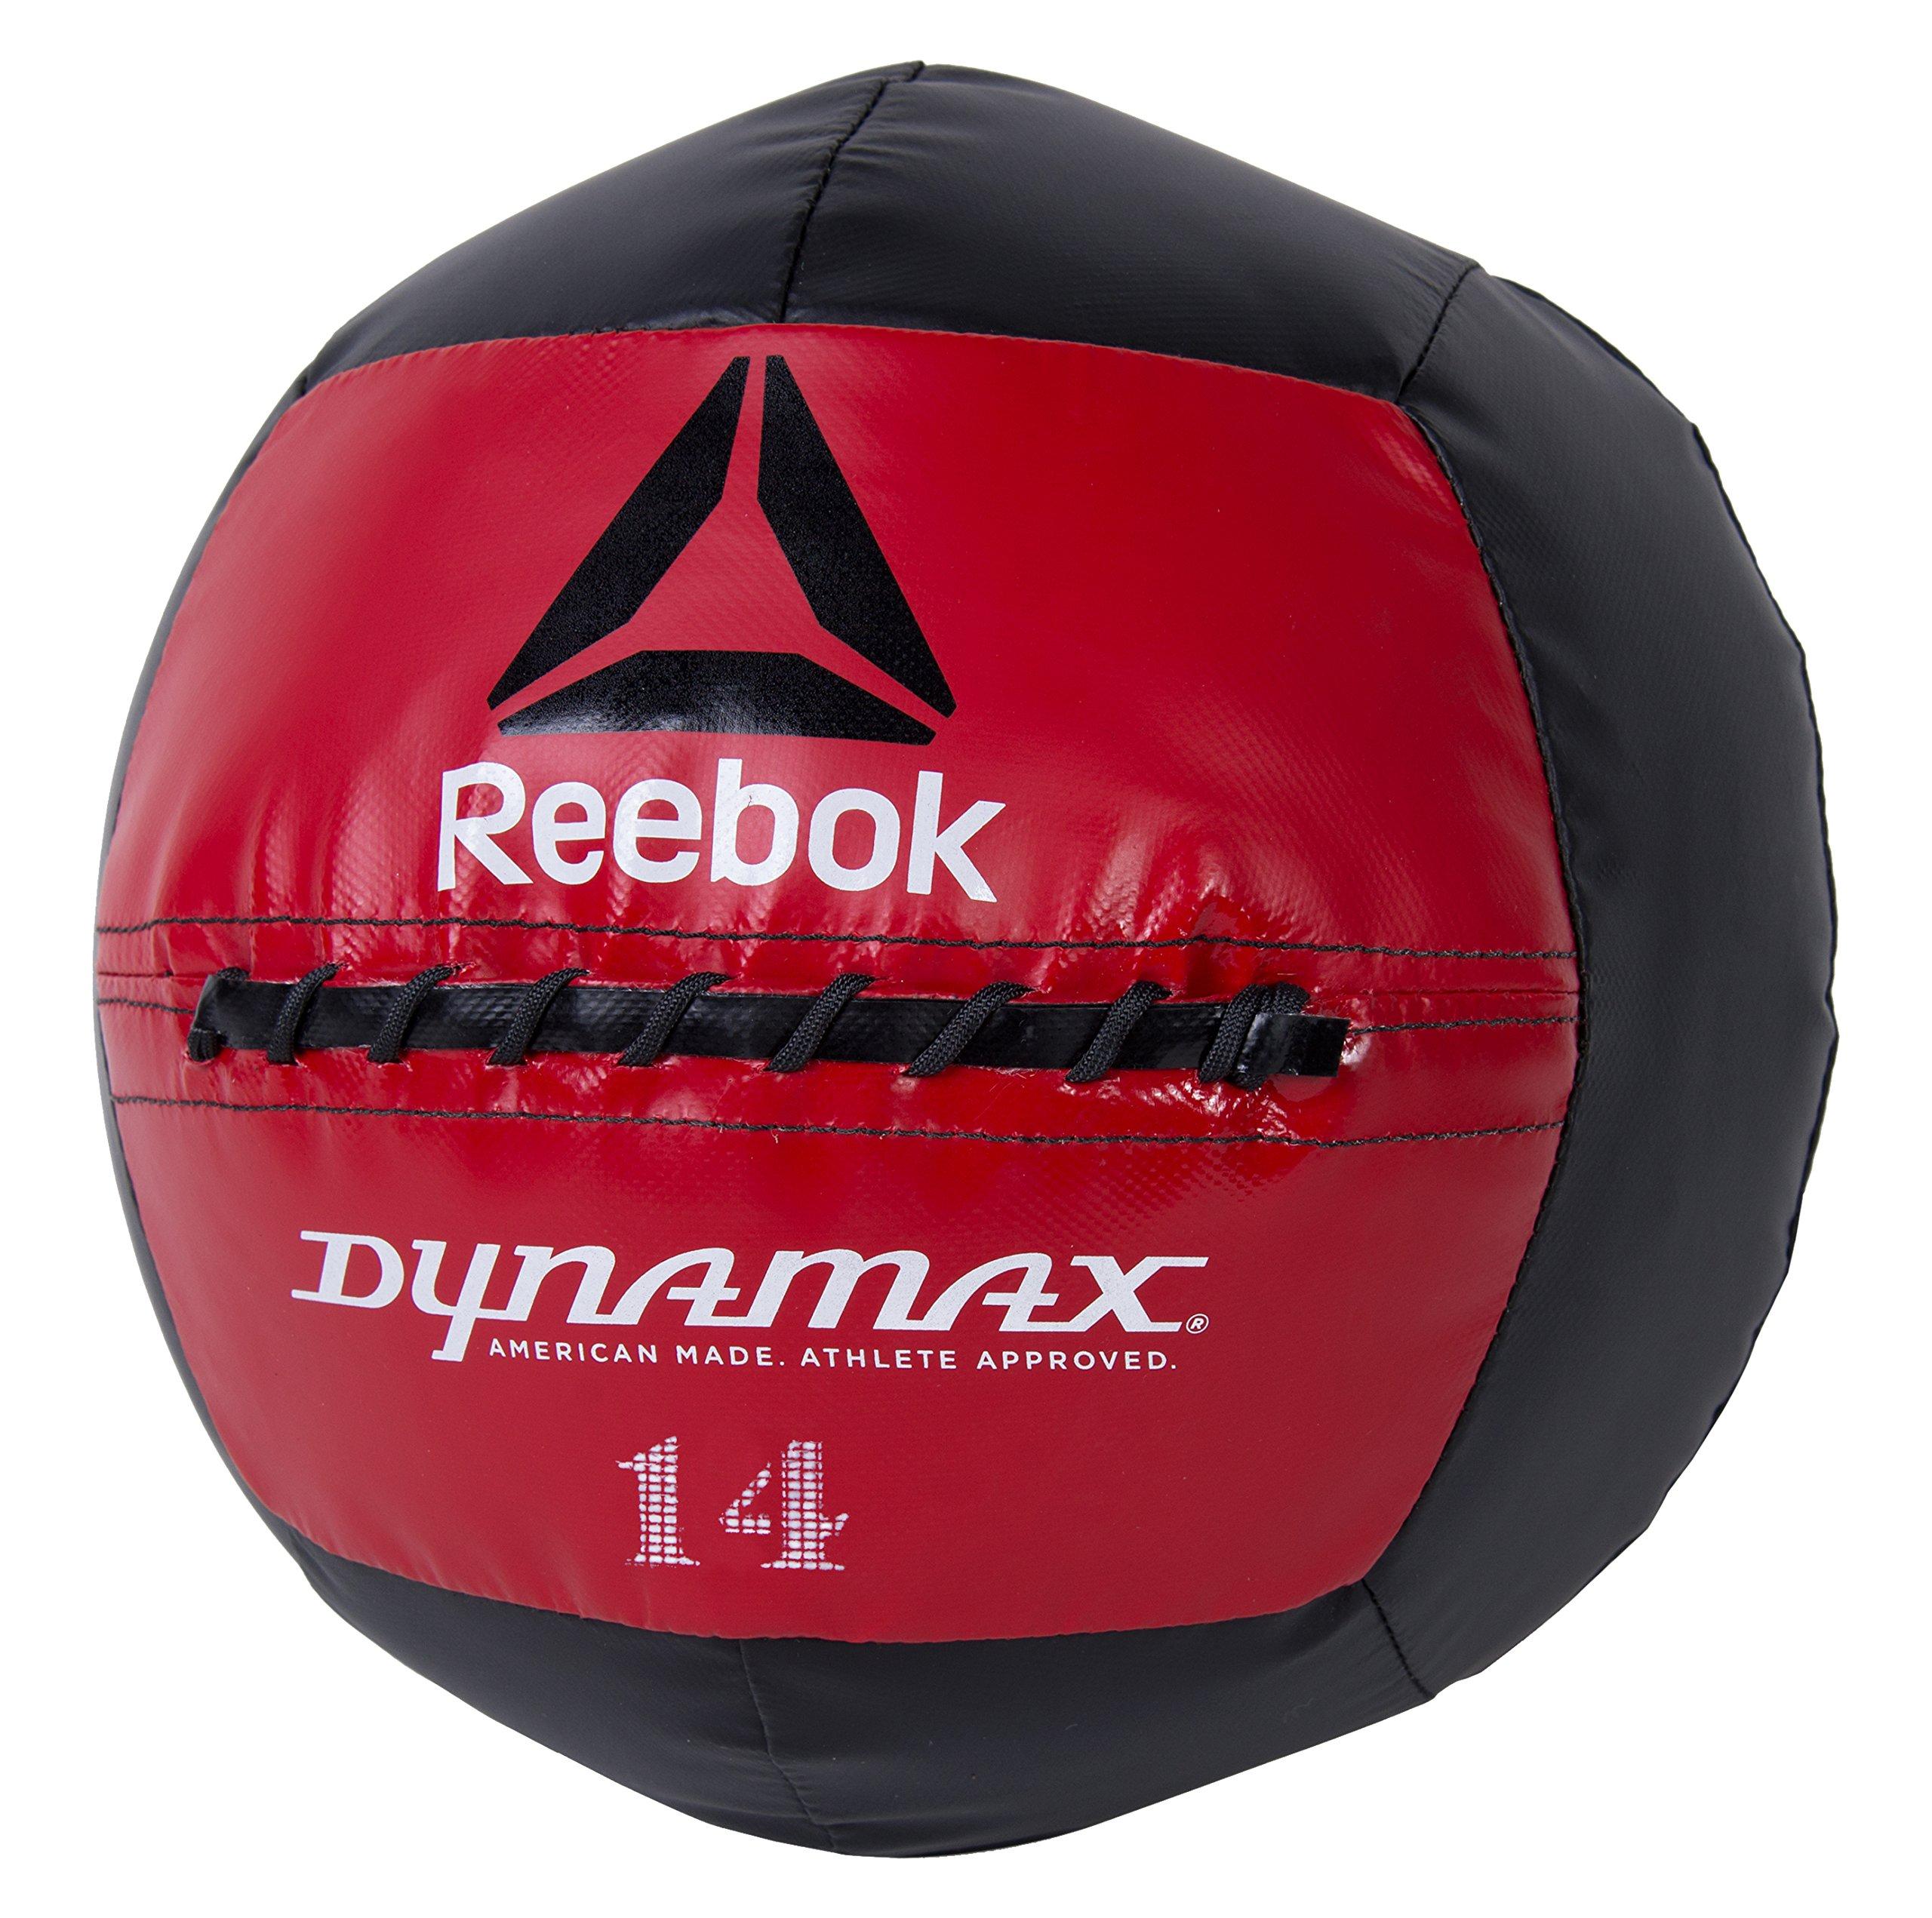 Reebok Soft-Shell Medicine Ball by Dynamax, 14 lbs